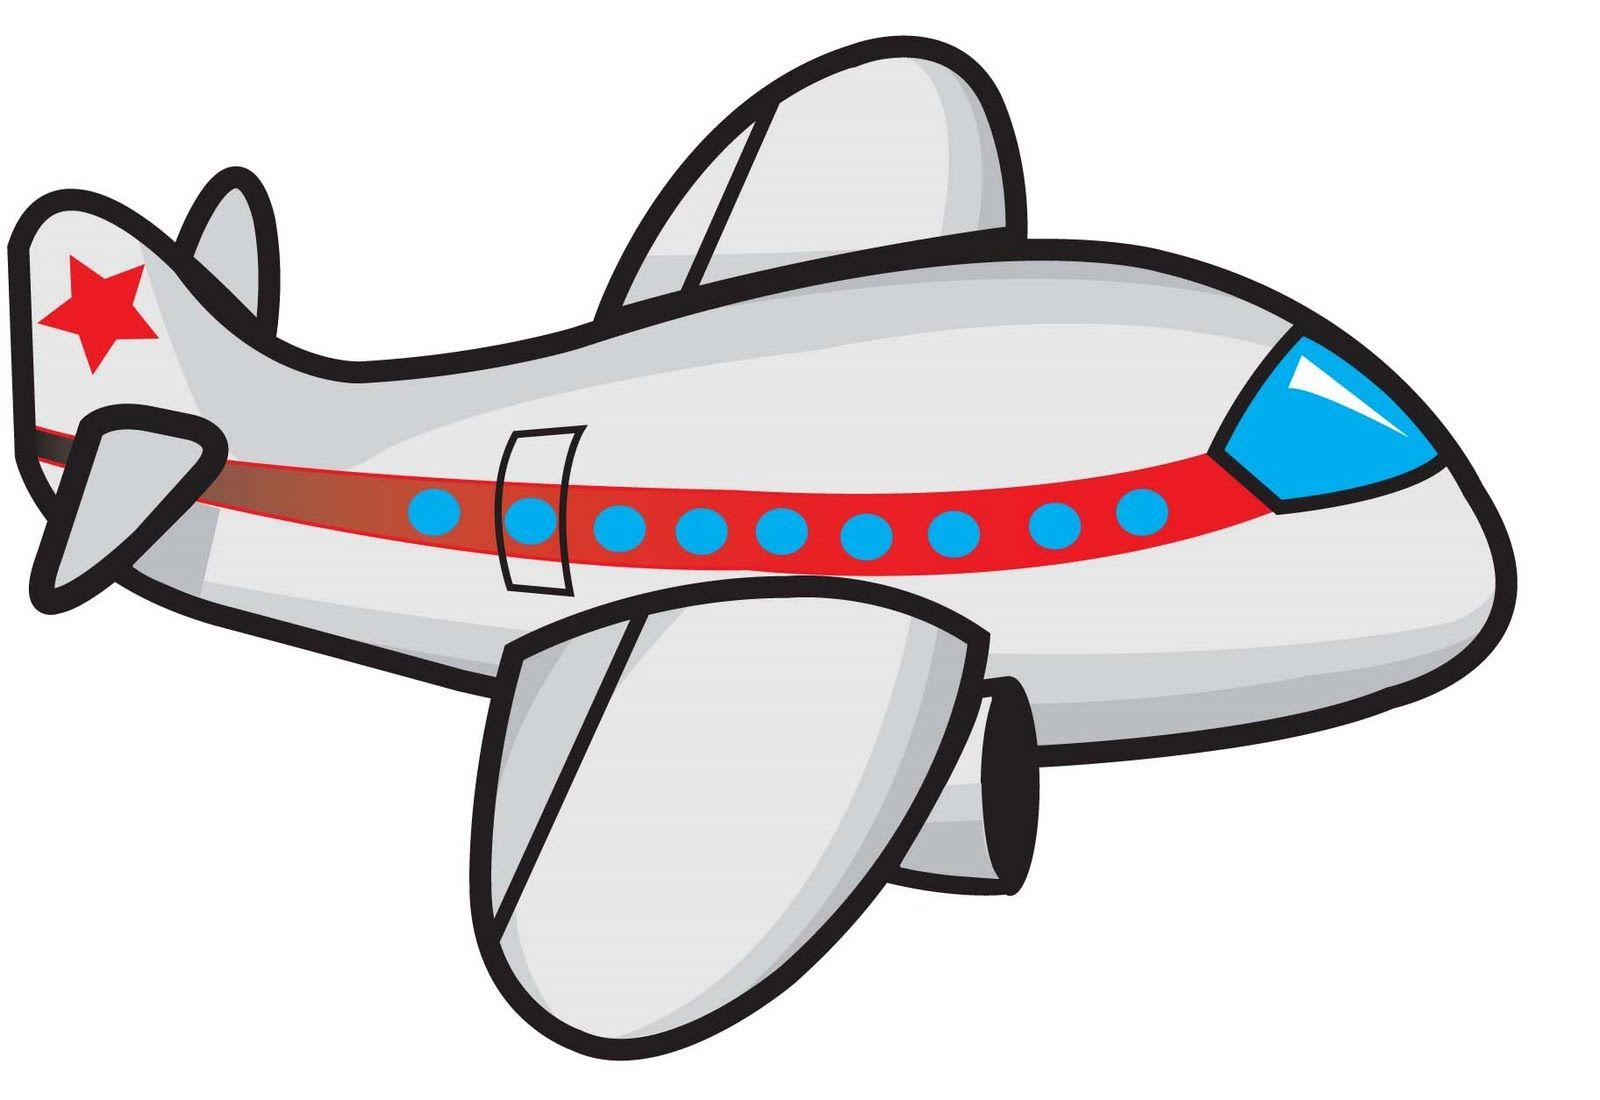 Airplane website the plane. Biplane clipart cute